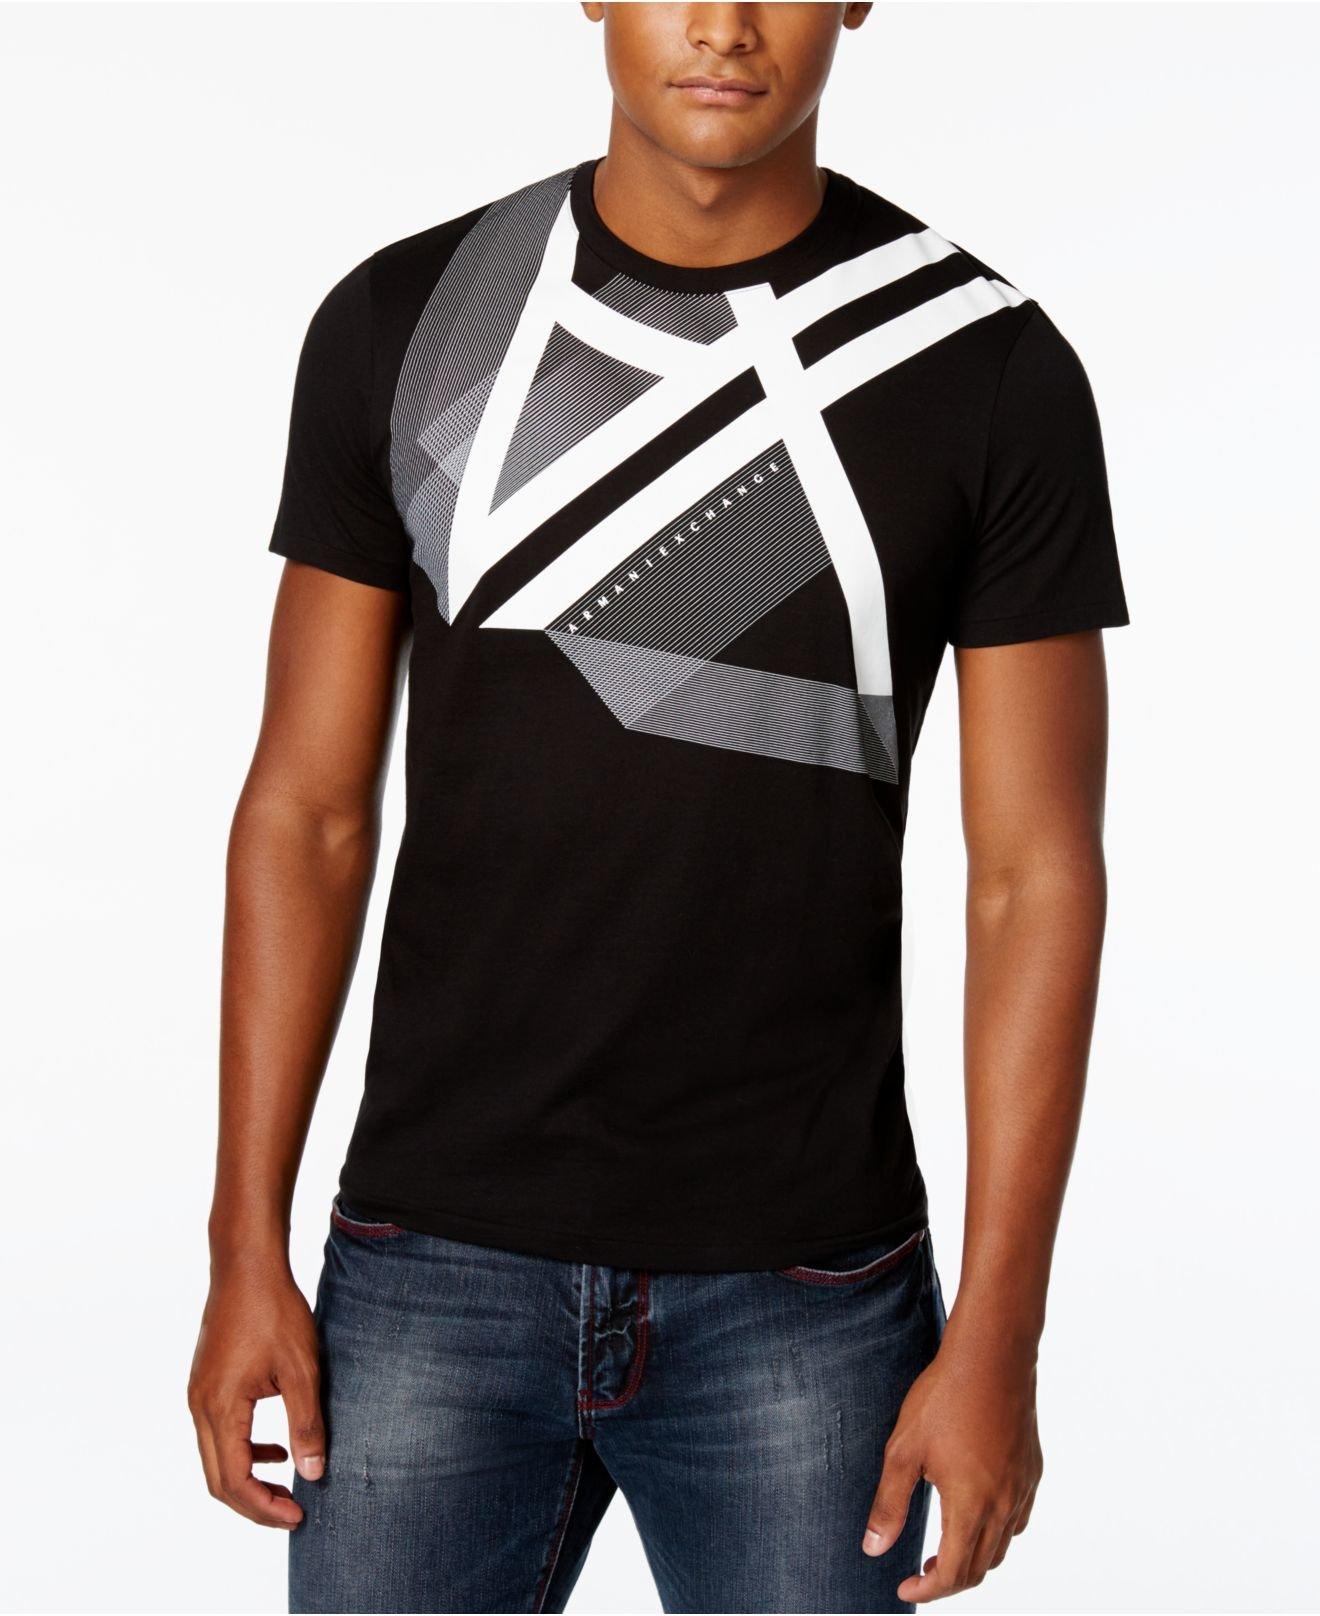 Armani exchange men 39 s right side up graphic print logo t for Black armani t shirt